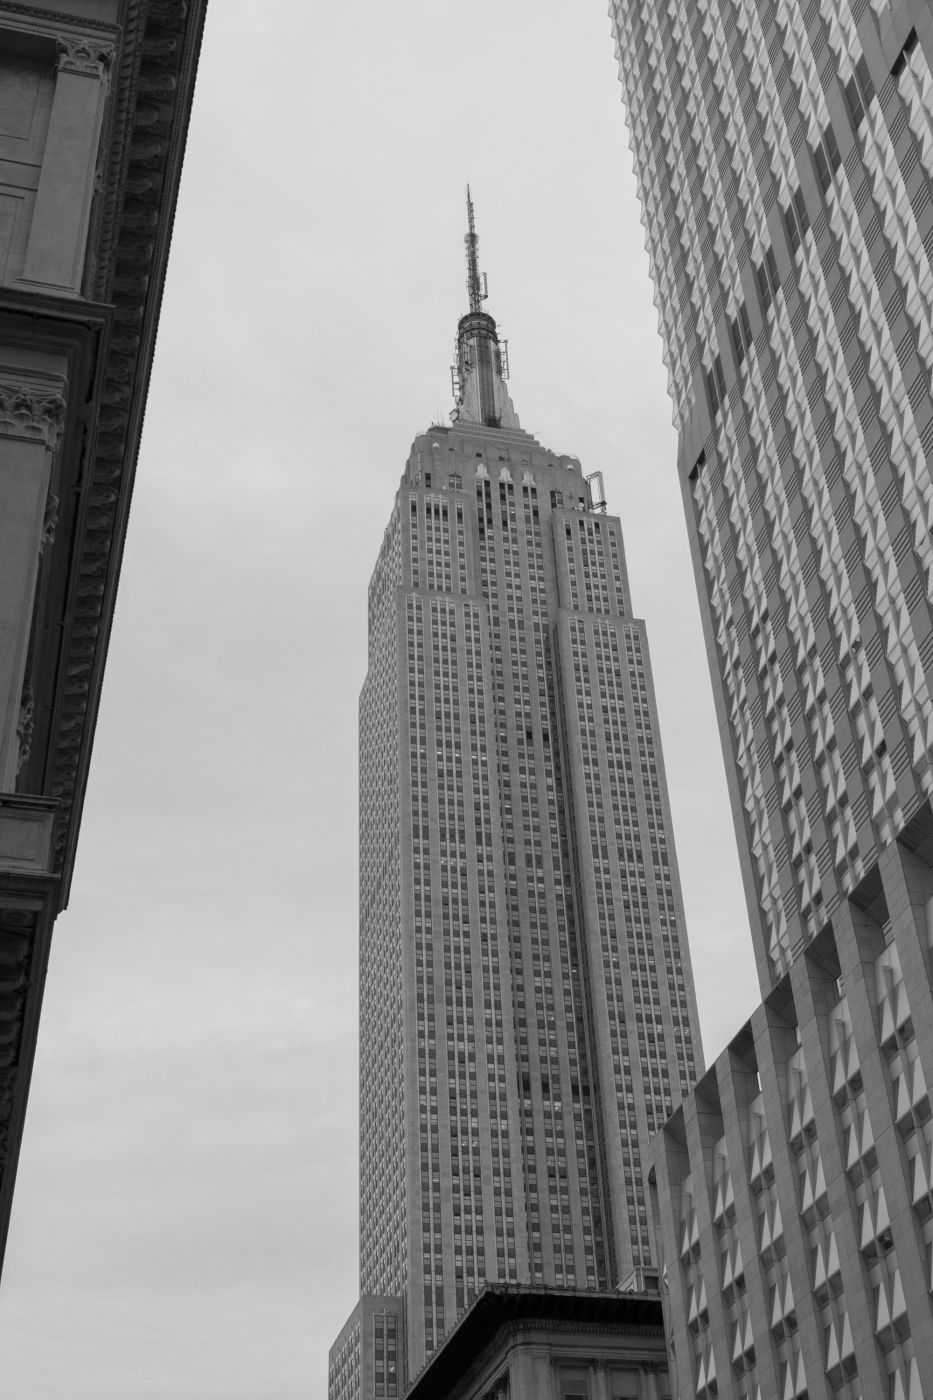 Empire State Building, USA